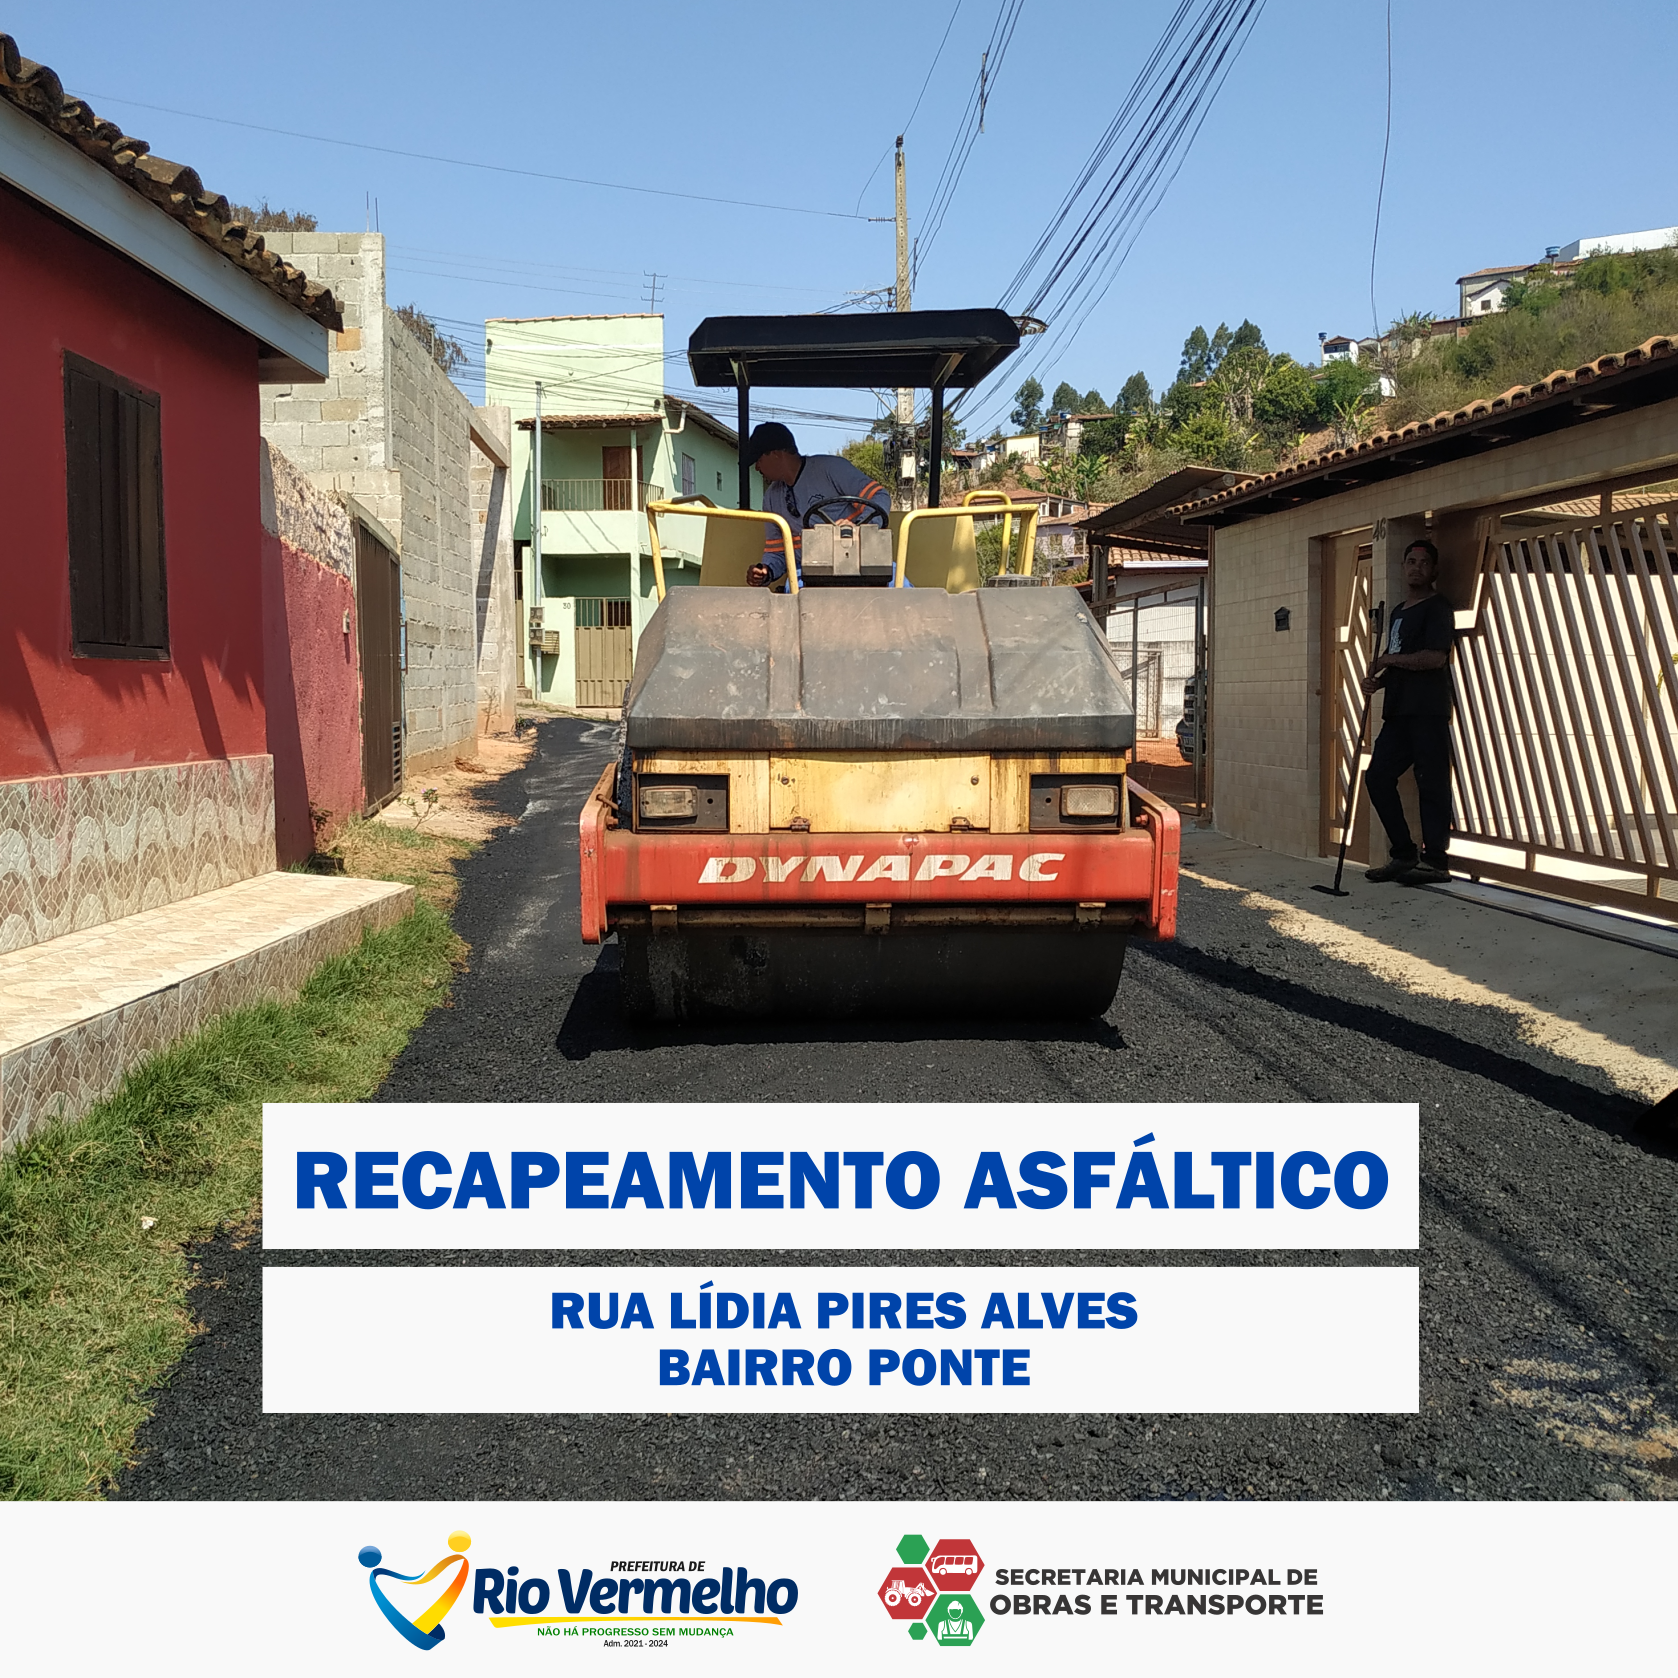 RECAPEAMENTO ASFÁLTICO – RUA PAULISTAS, BAIRRO PONTE